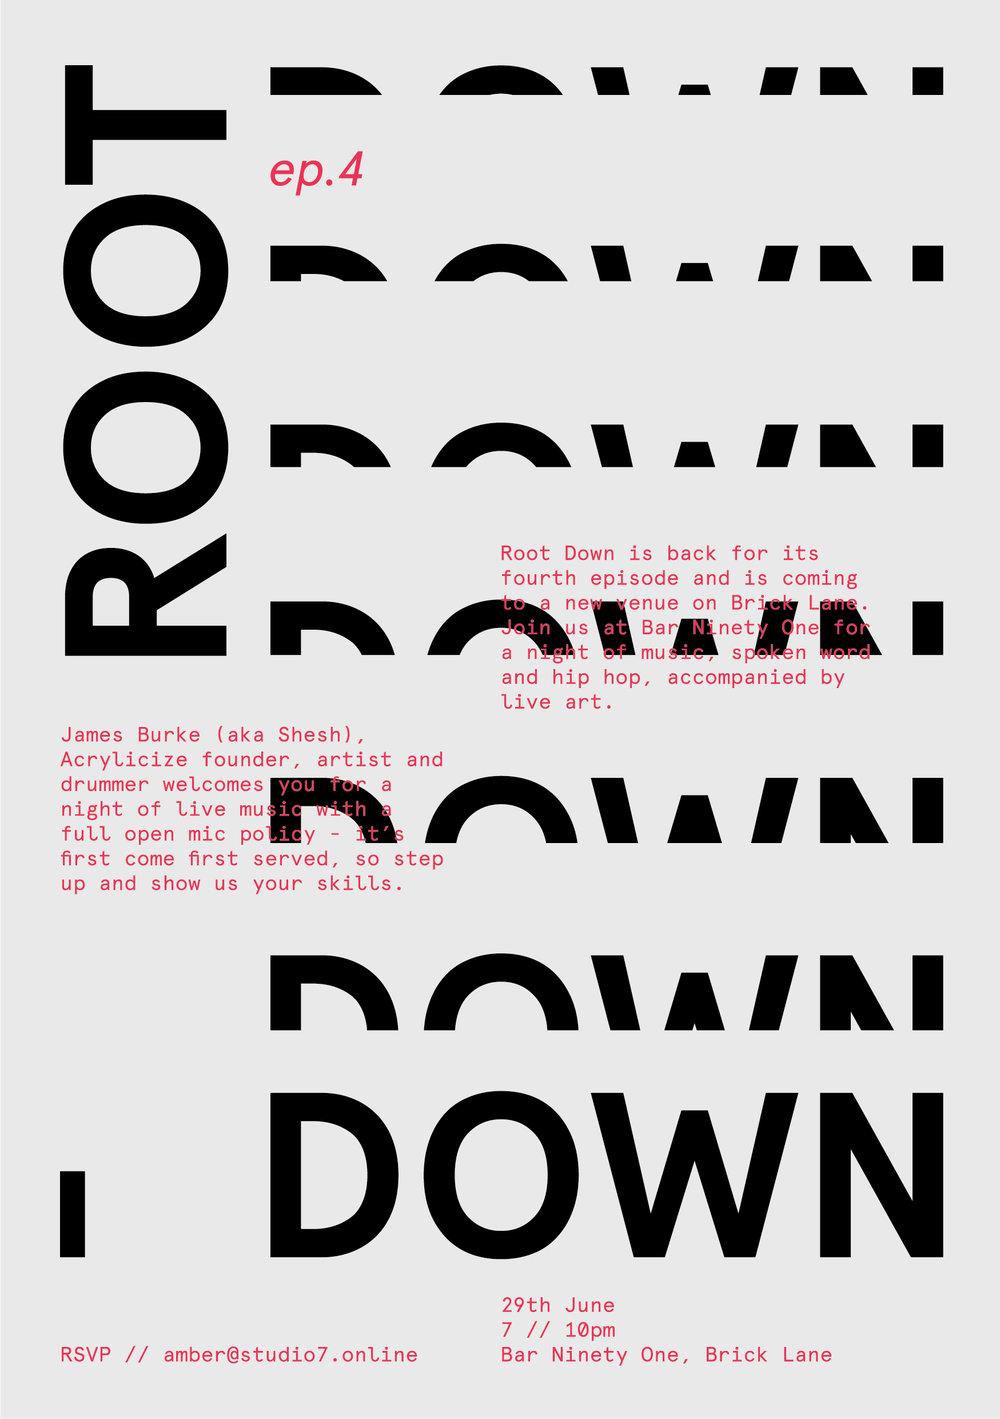 RootDown_Poster_A5-02.jpg